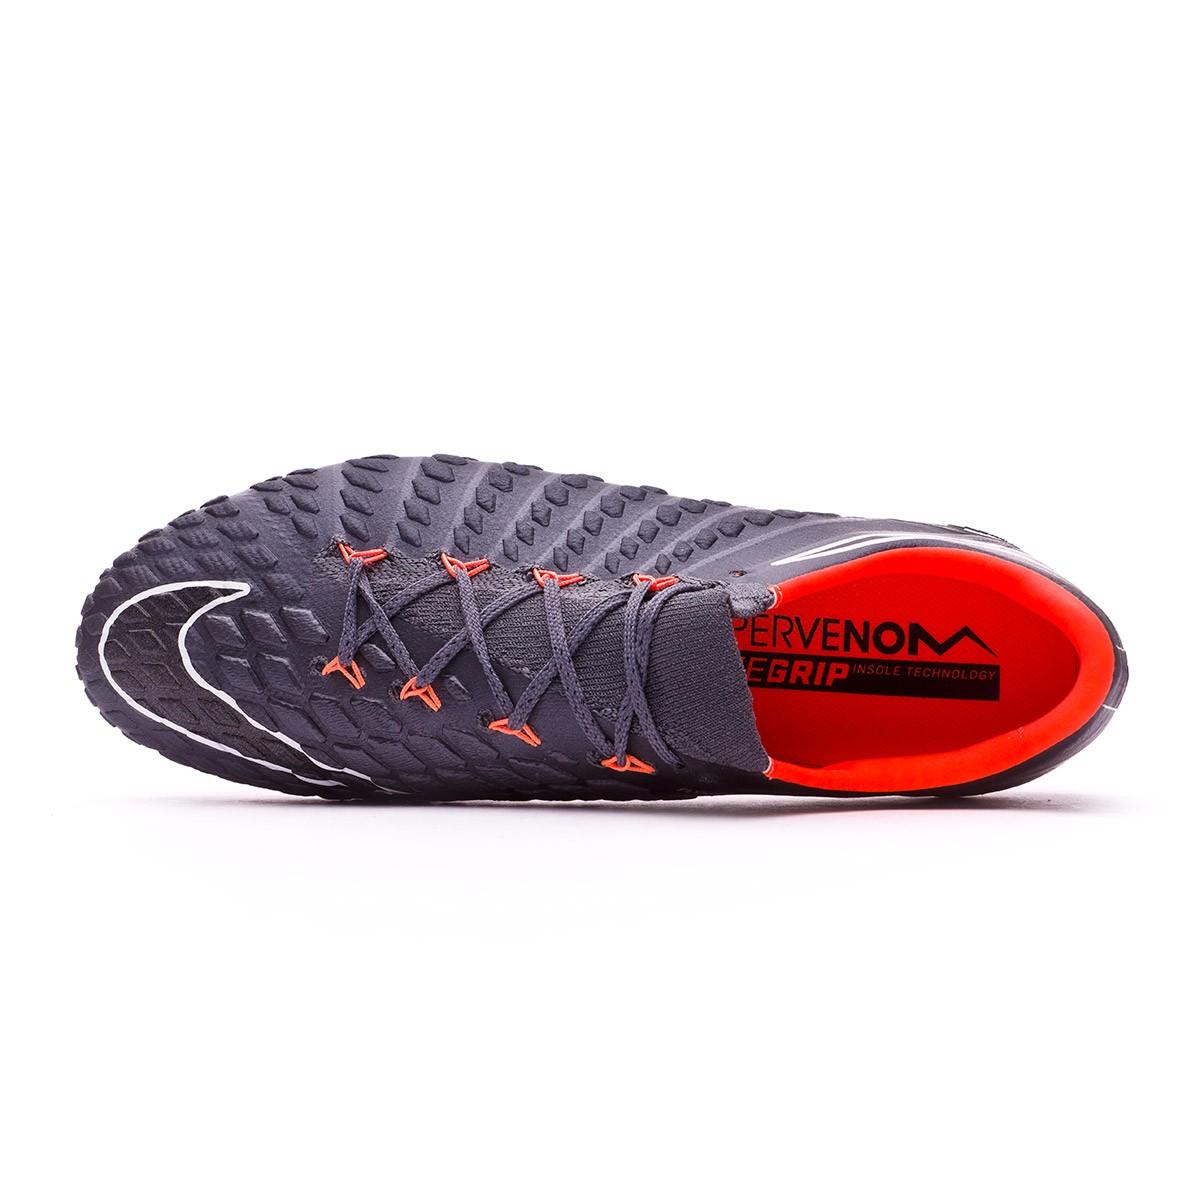 Stivali Nike Hypervenom Phantom III Elite FG arancia Dark grigio Total arancia FG   b12857